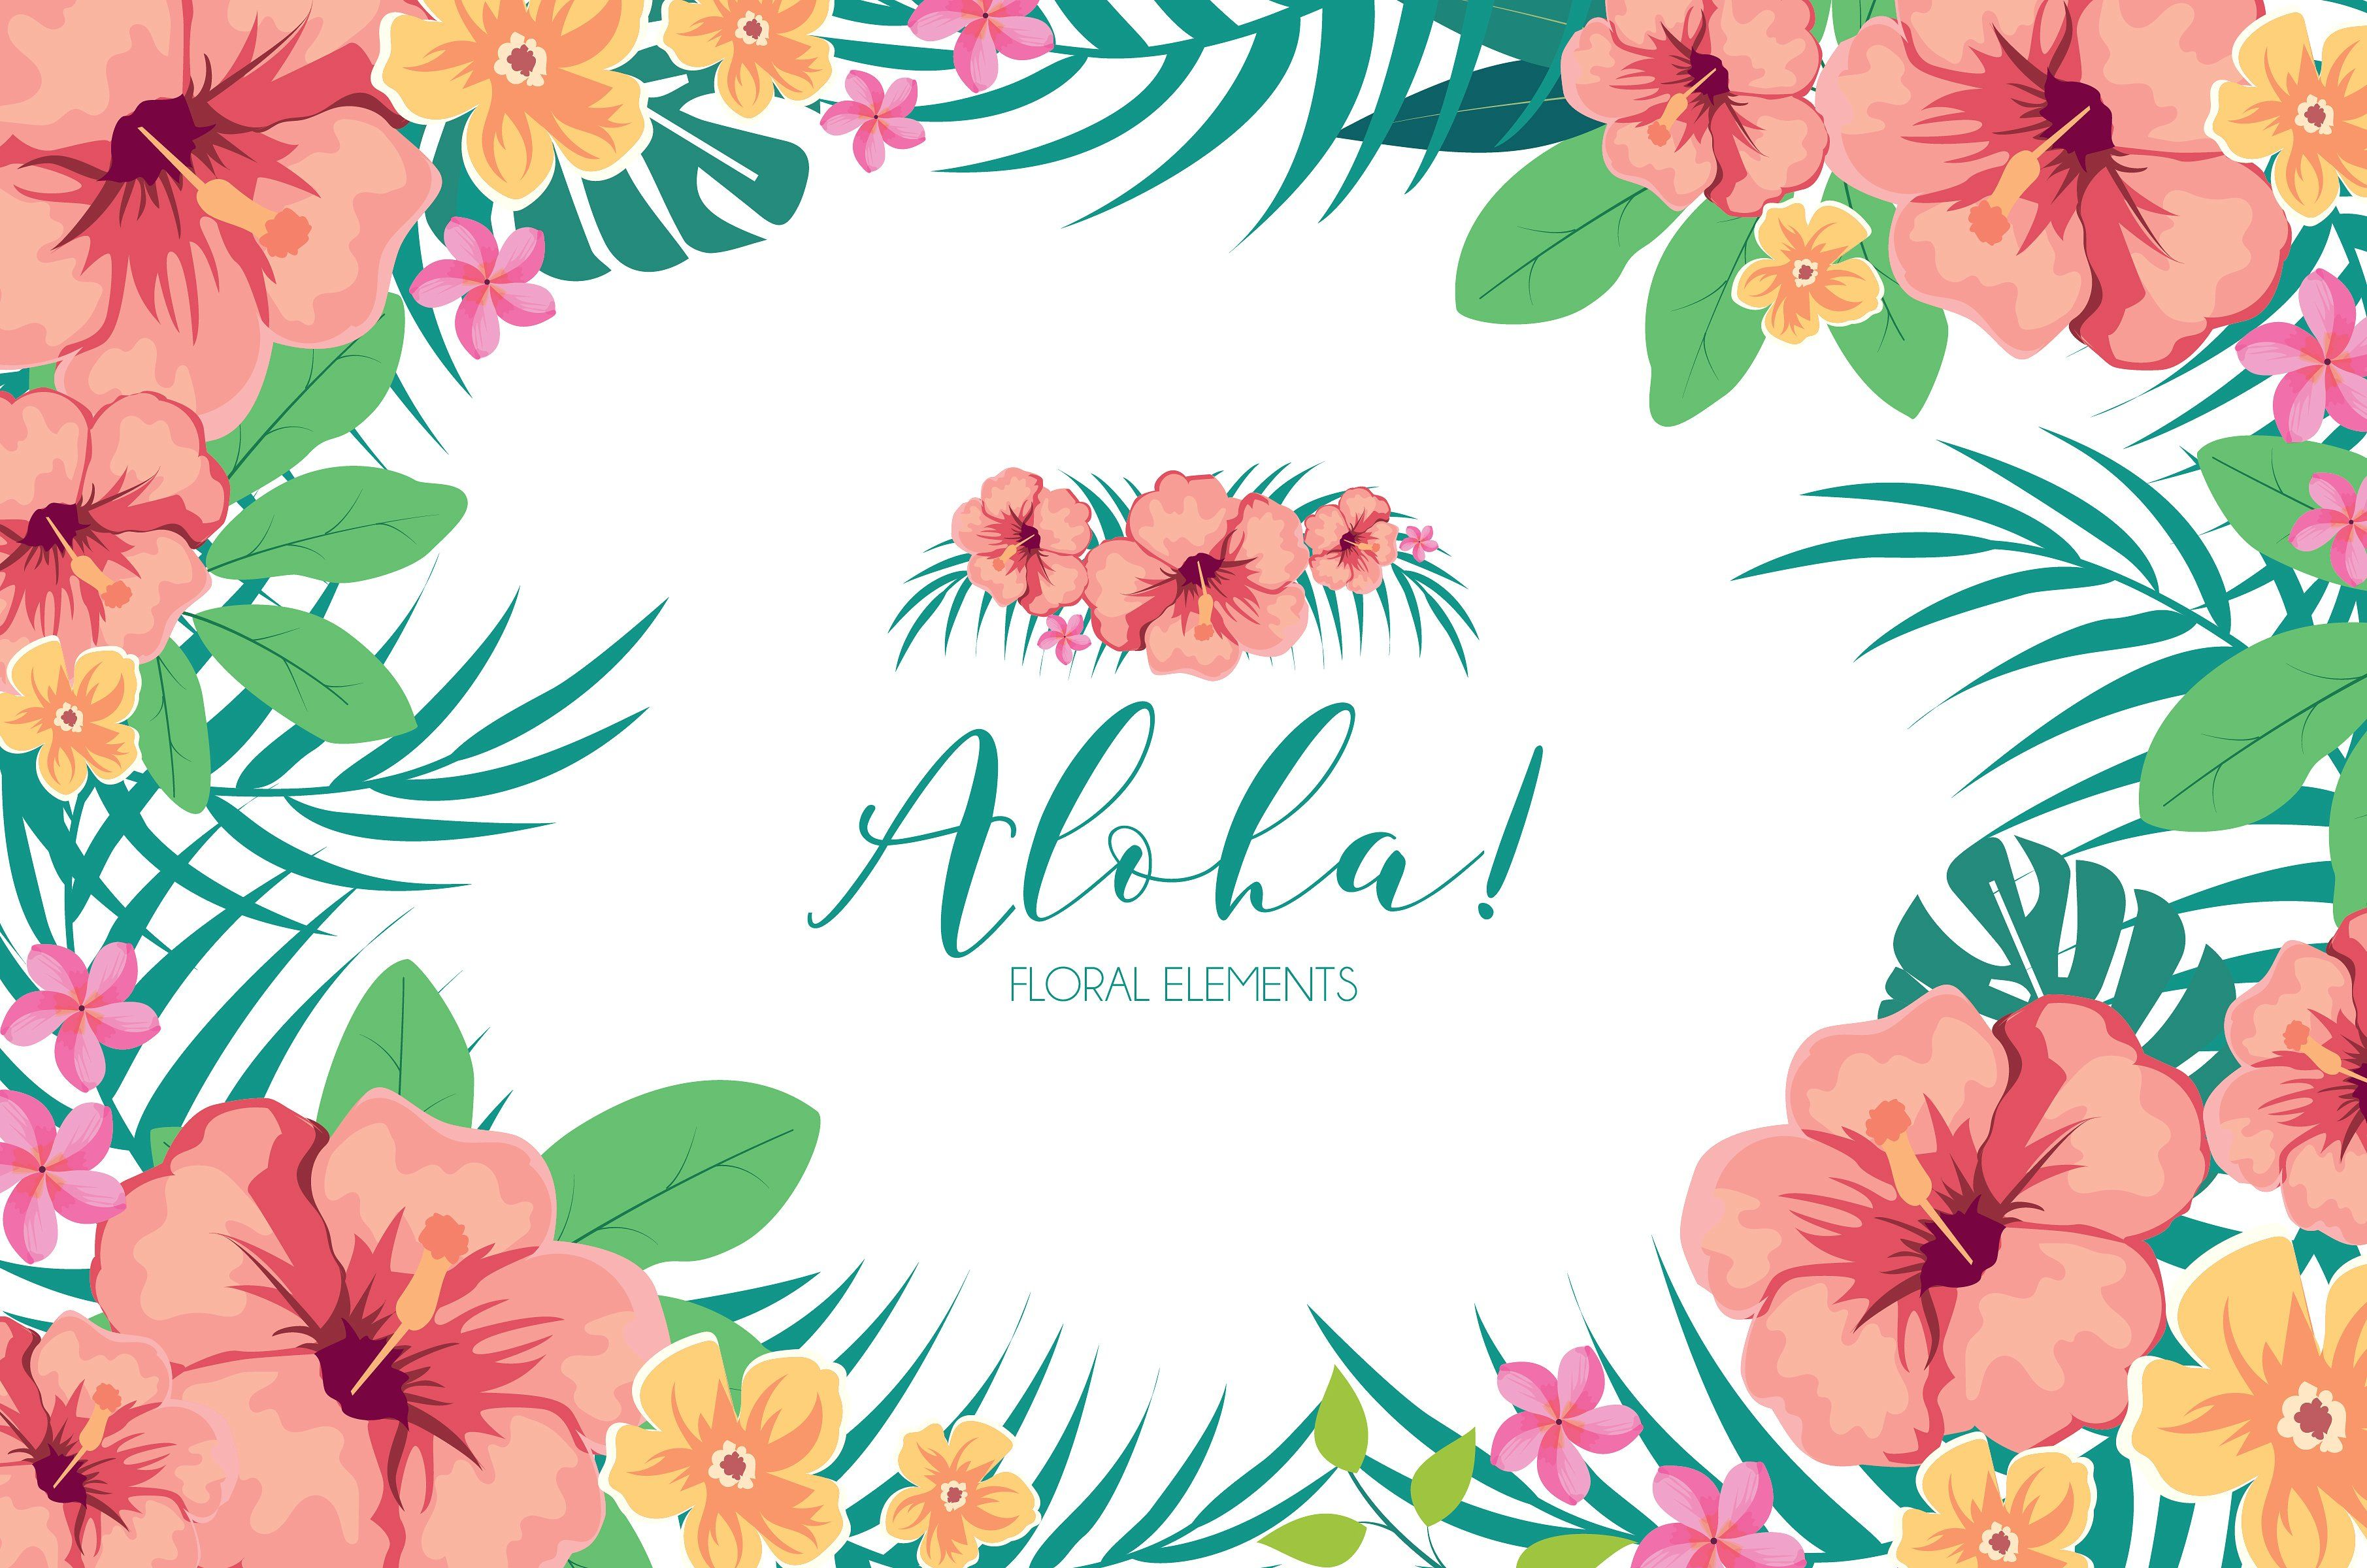 Tropical hawaiian flowers clipart by cutepaperstudio on tropical hawaiian flowers clipart by cutepaperstudio on creativemarket izmirmasajfo